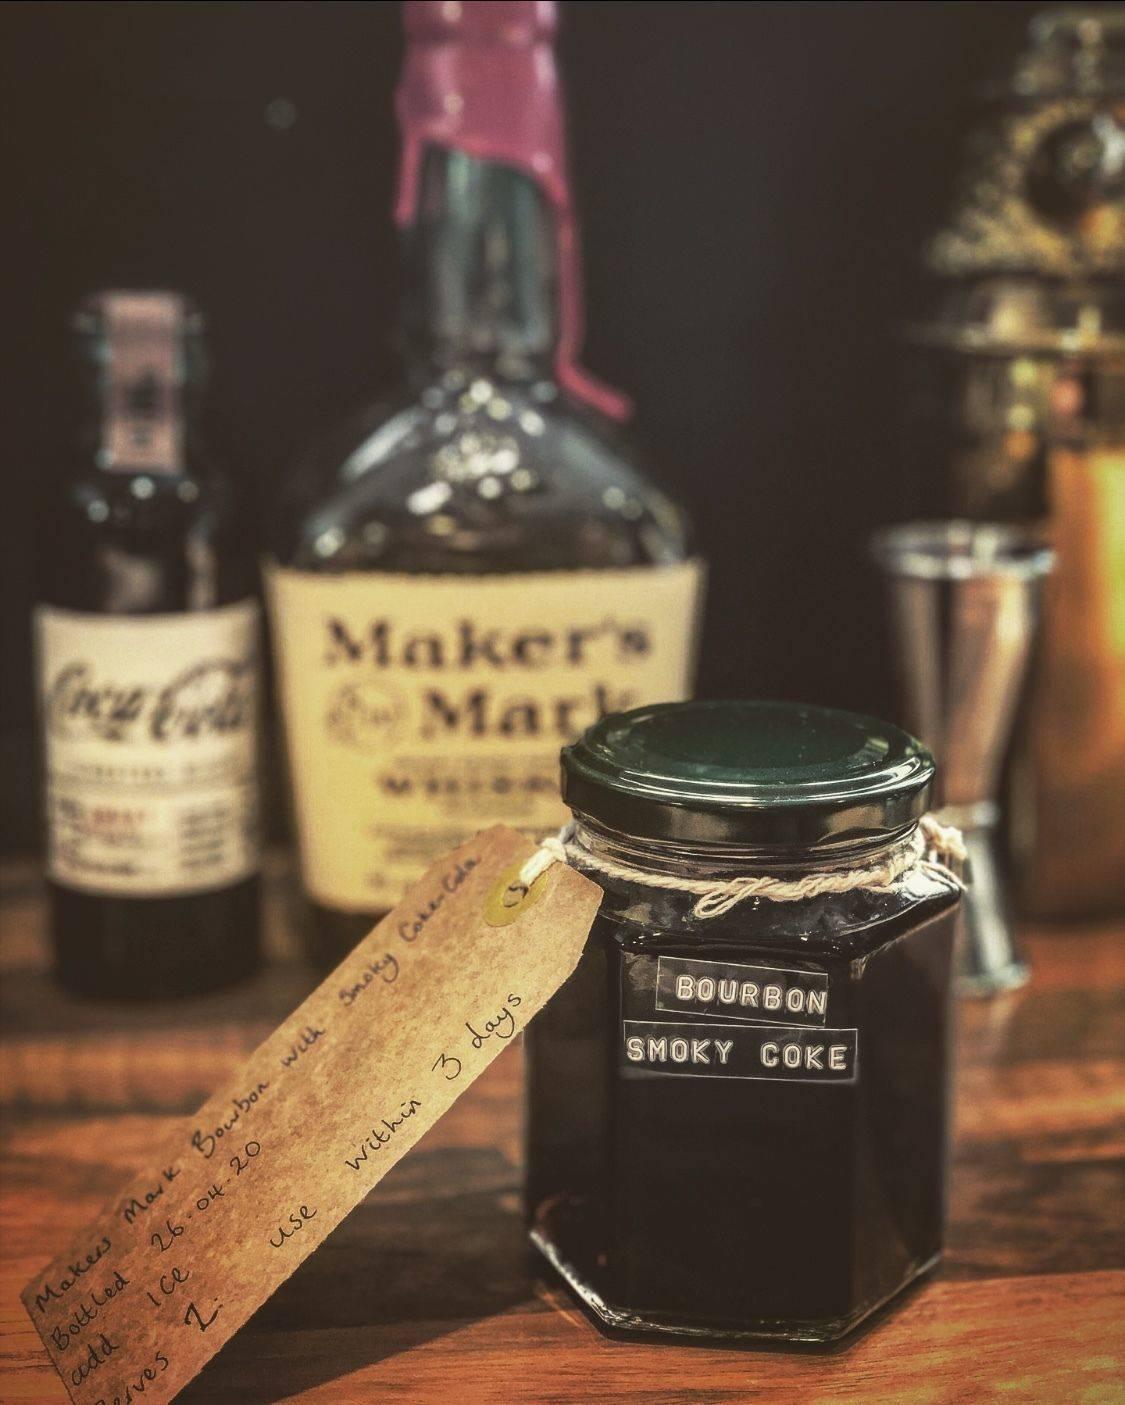 Makers Mark Bourbon with smoky Coke (serves 2)